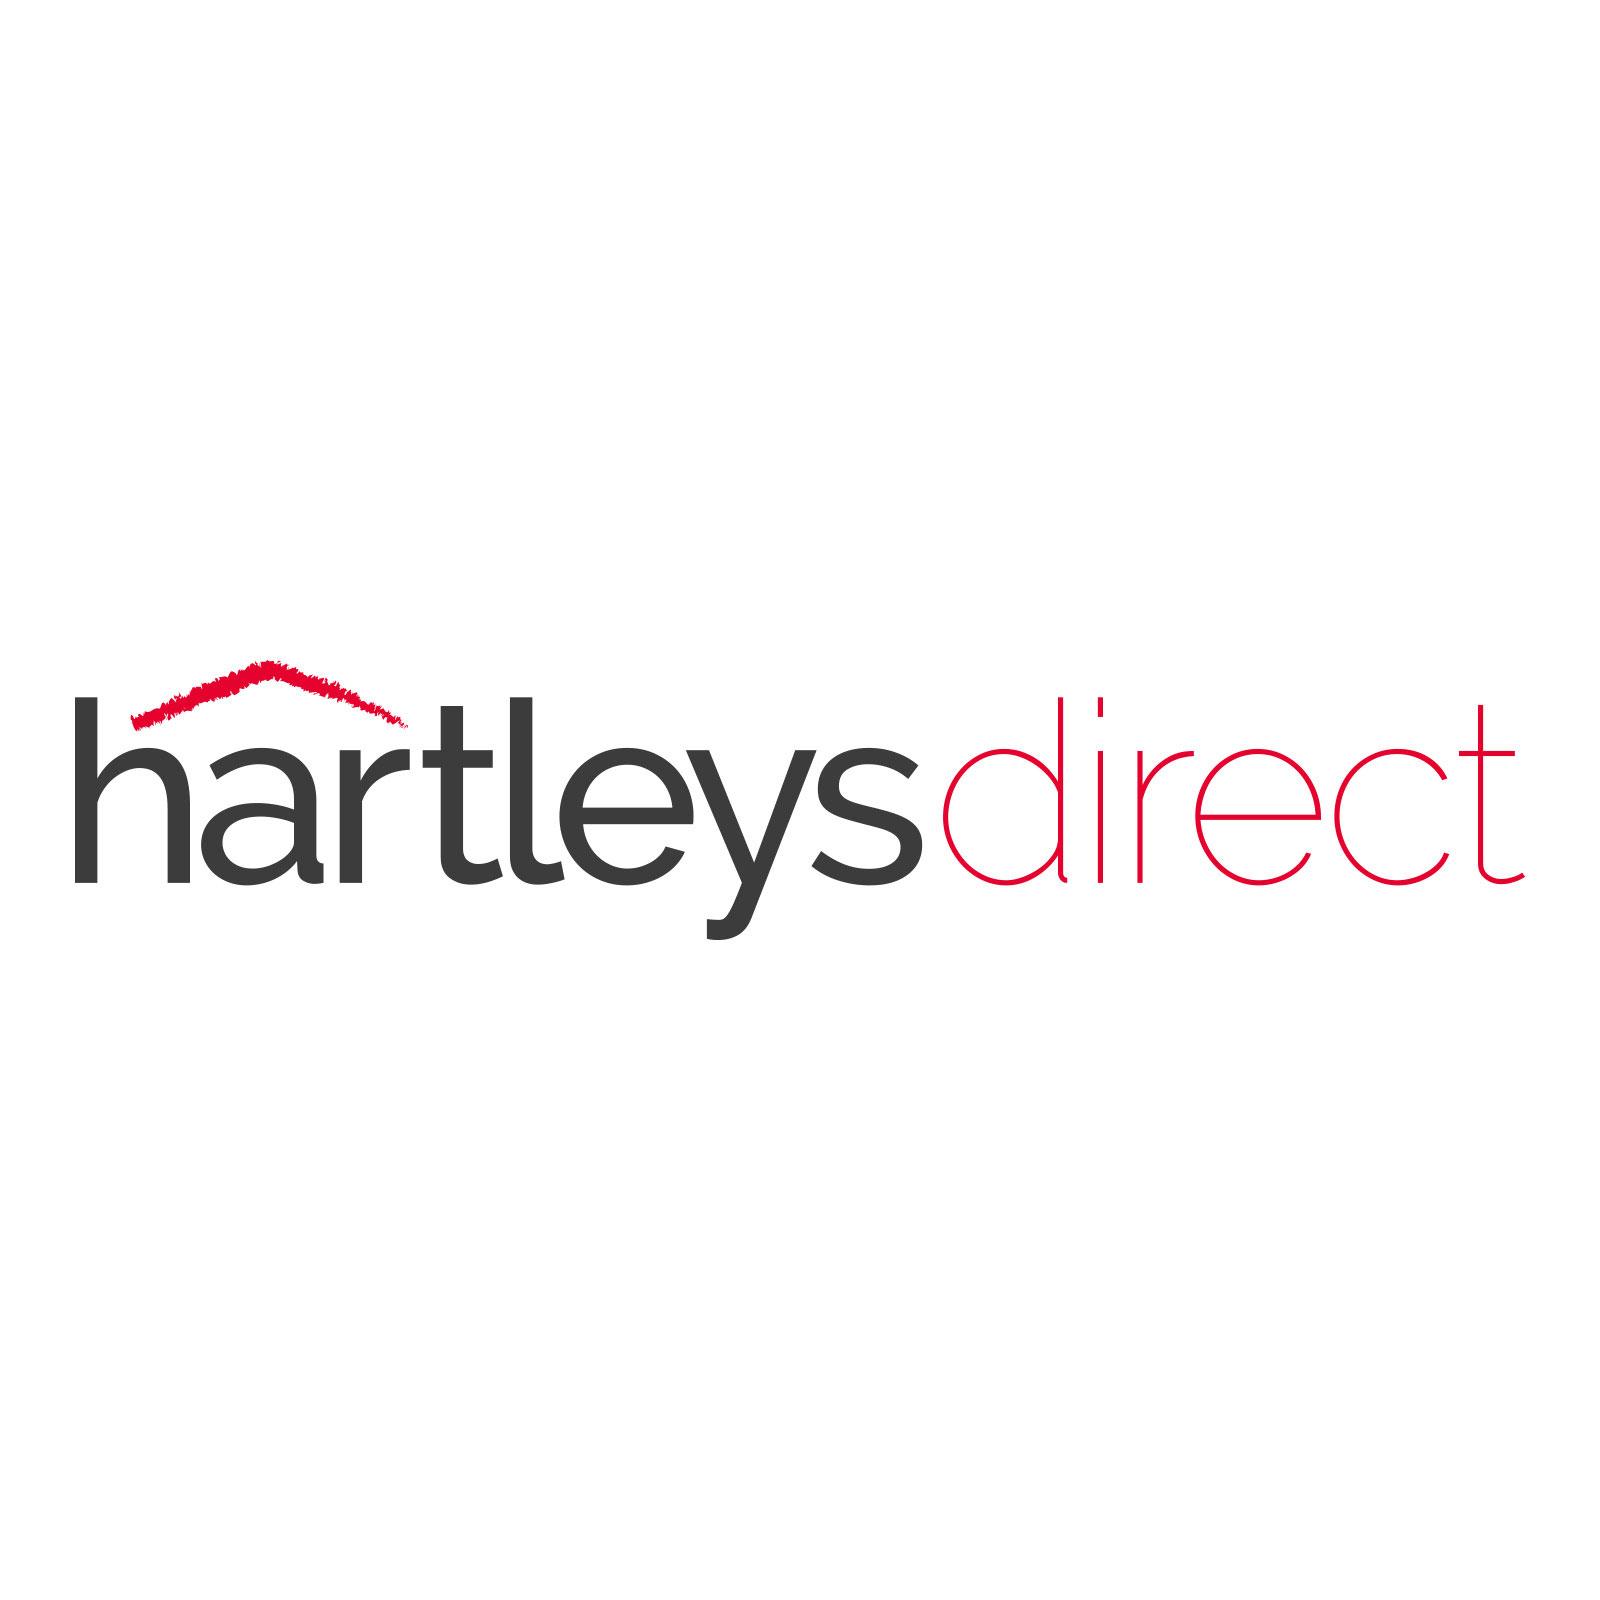 Hartleys-6ft-White-Folding-Table-on-a-White-Background.jpg